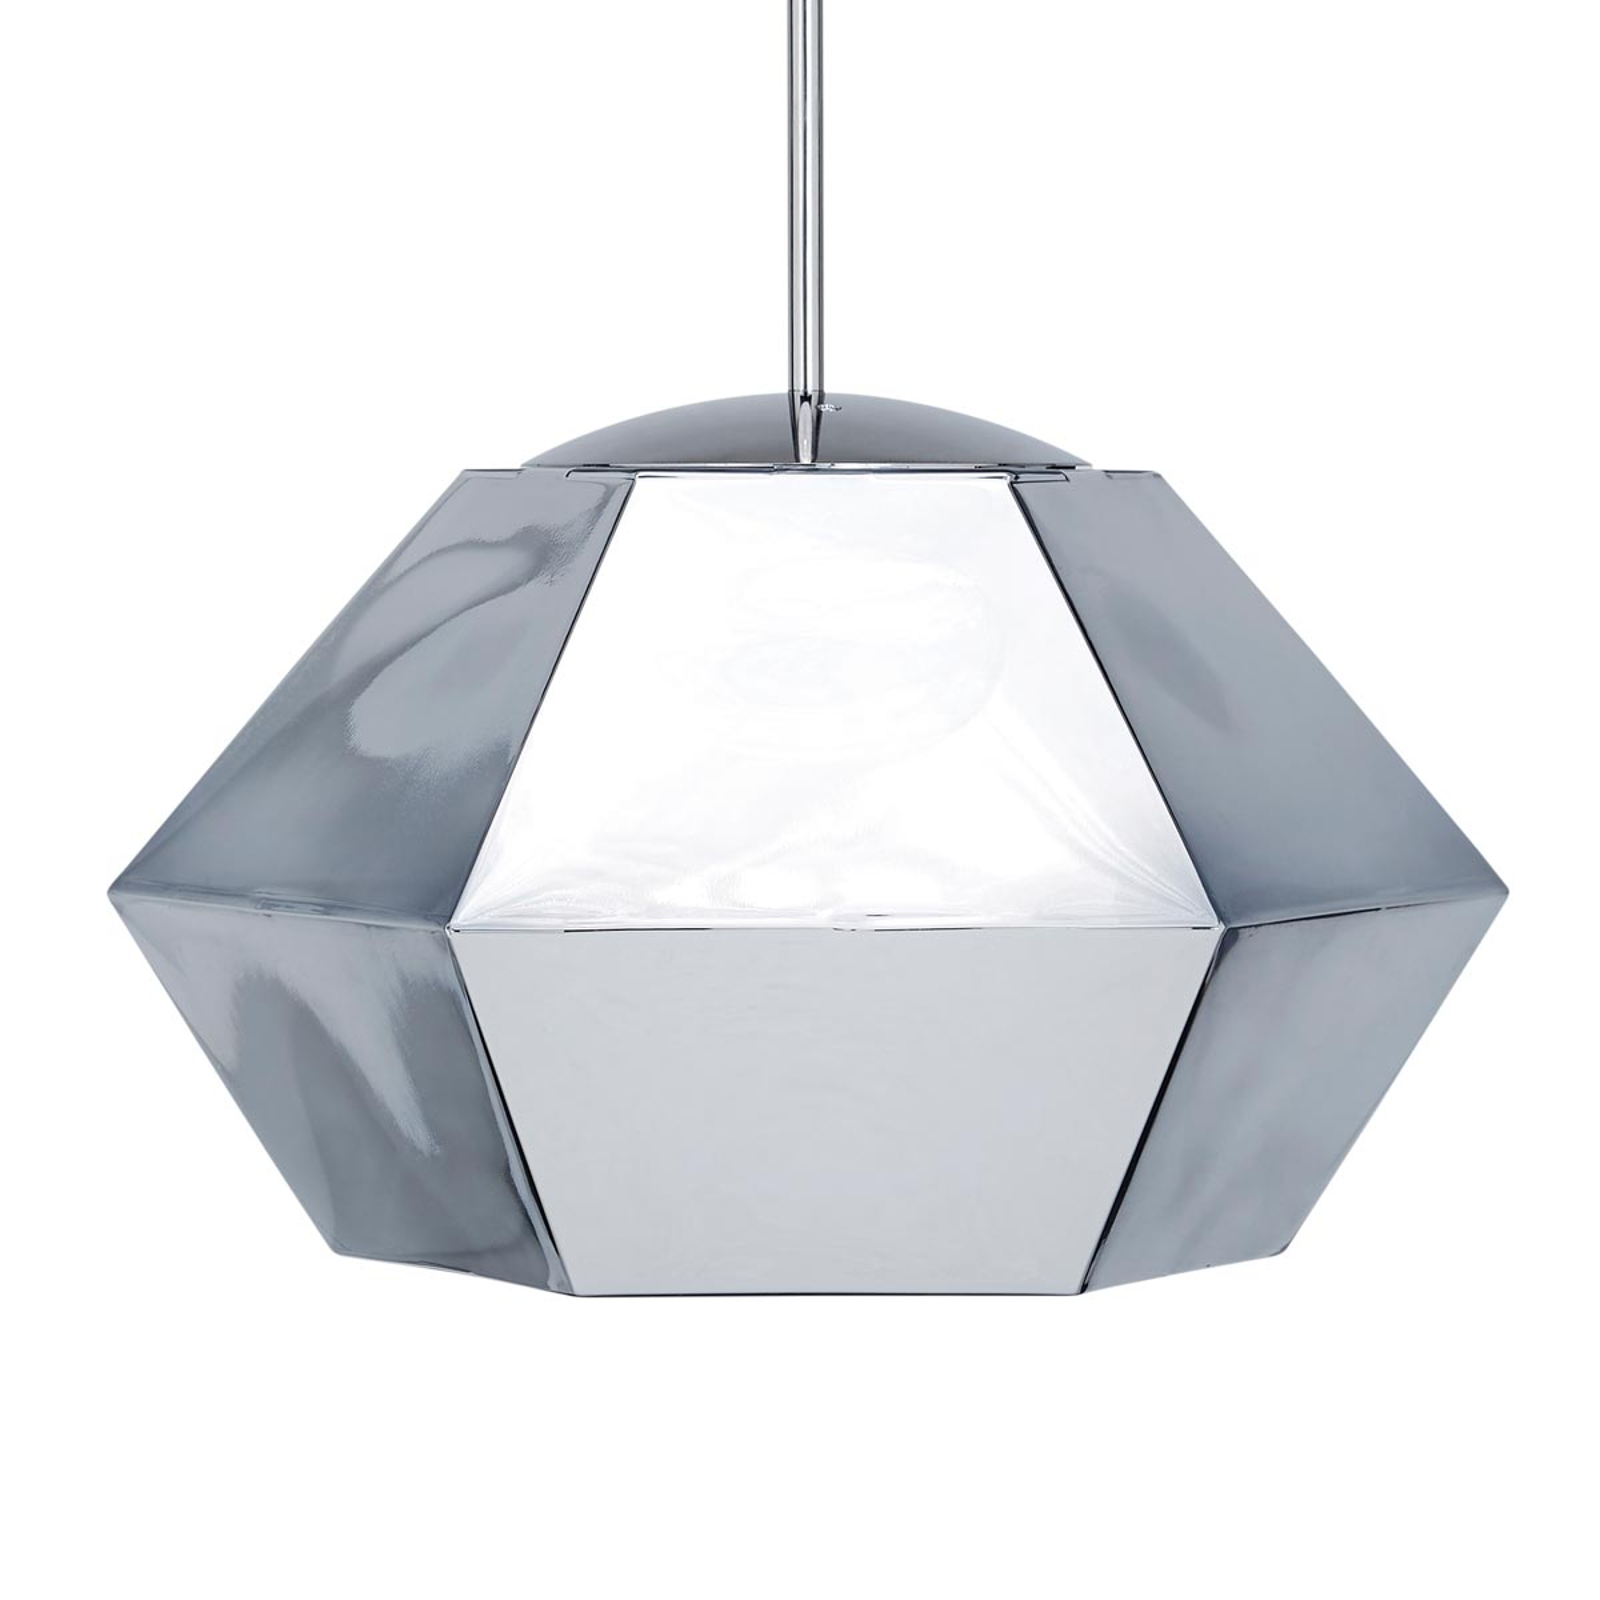 Affascinante lampada sospensione Cut Short, cromo